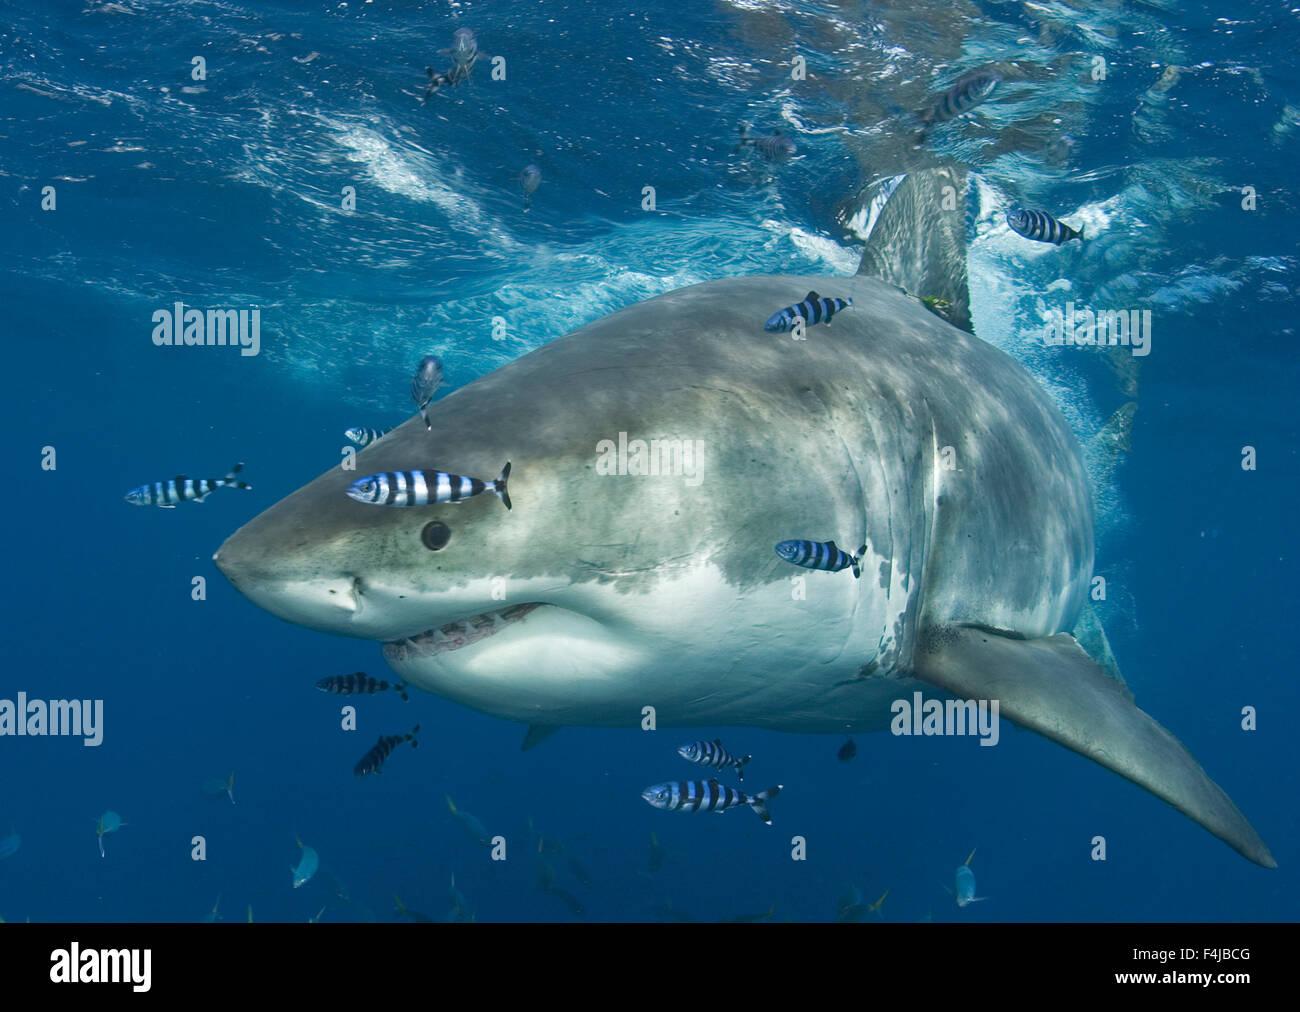 Big shark small fish stock photos big shark small fish for Great white shark fishing